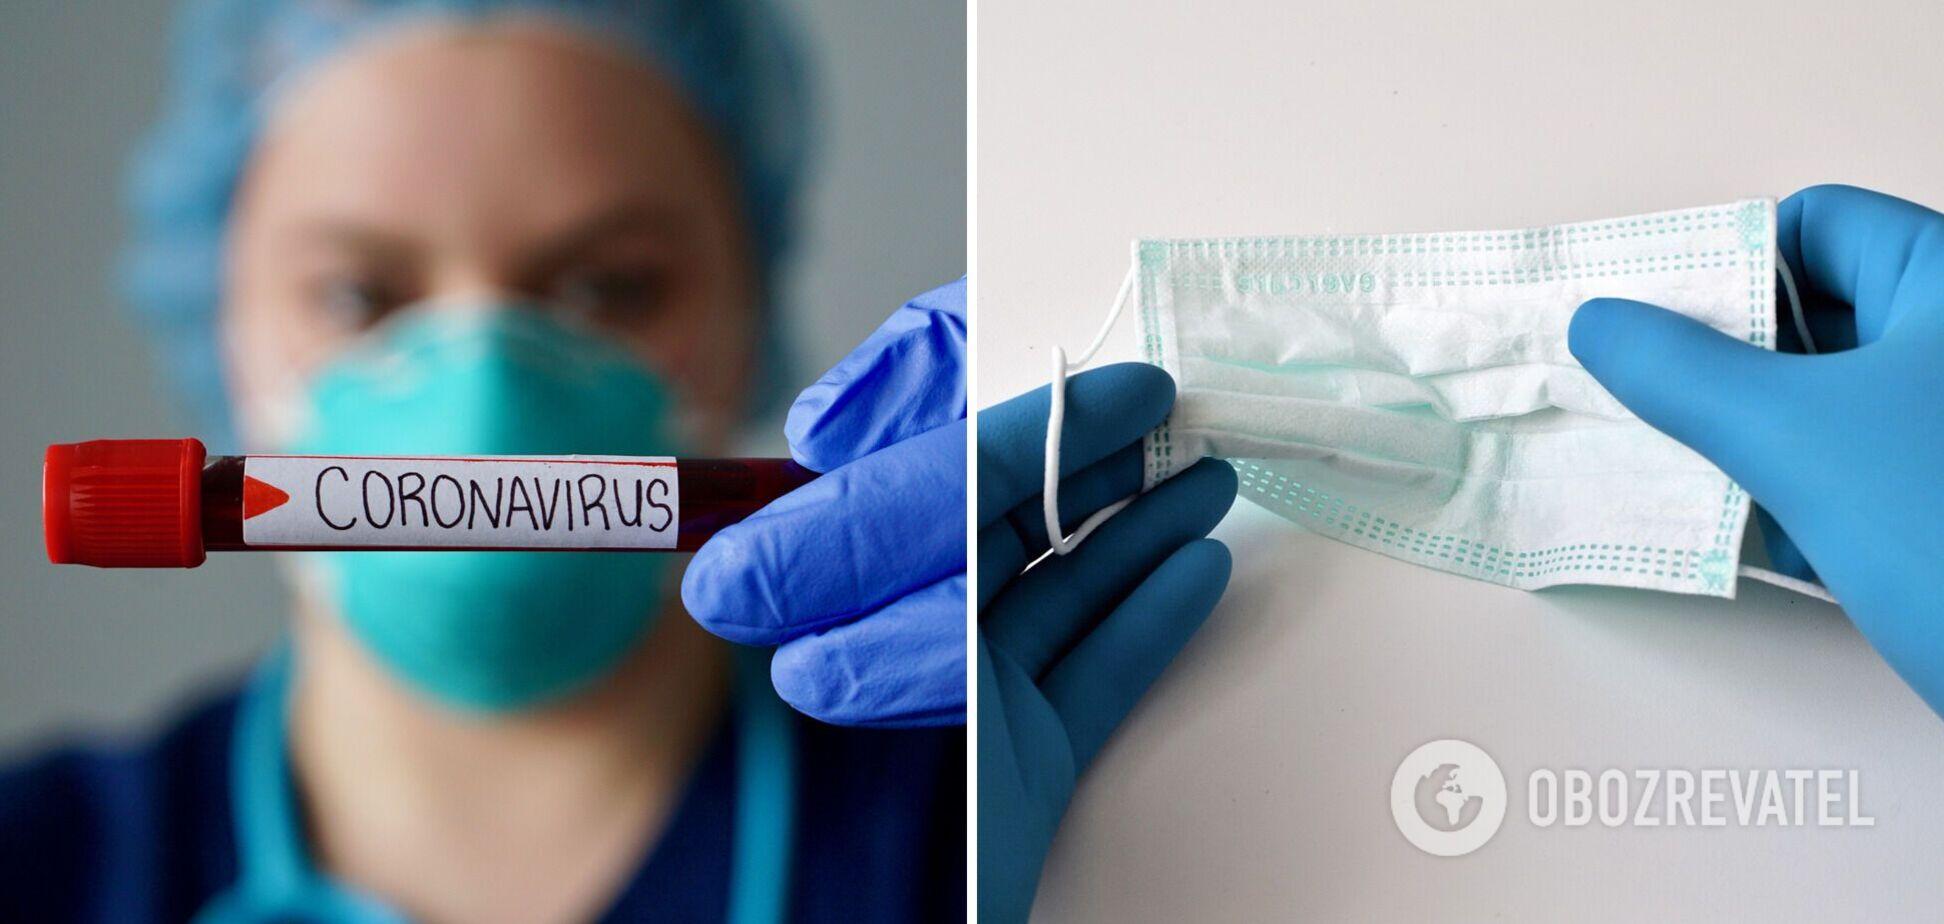 В Украине за сутки коронавирусом заразились более 850 человек, из них 23 – дети